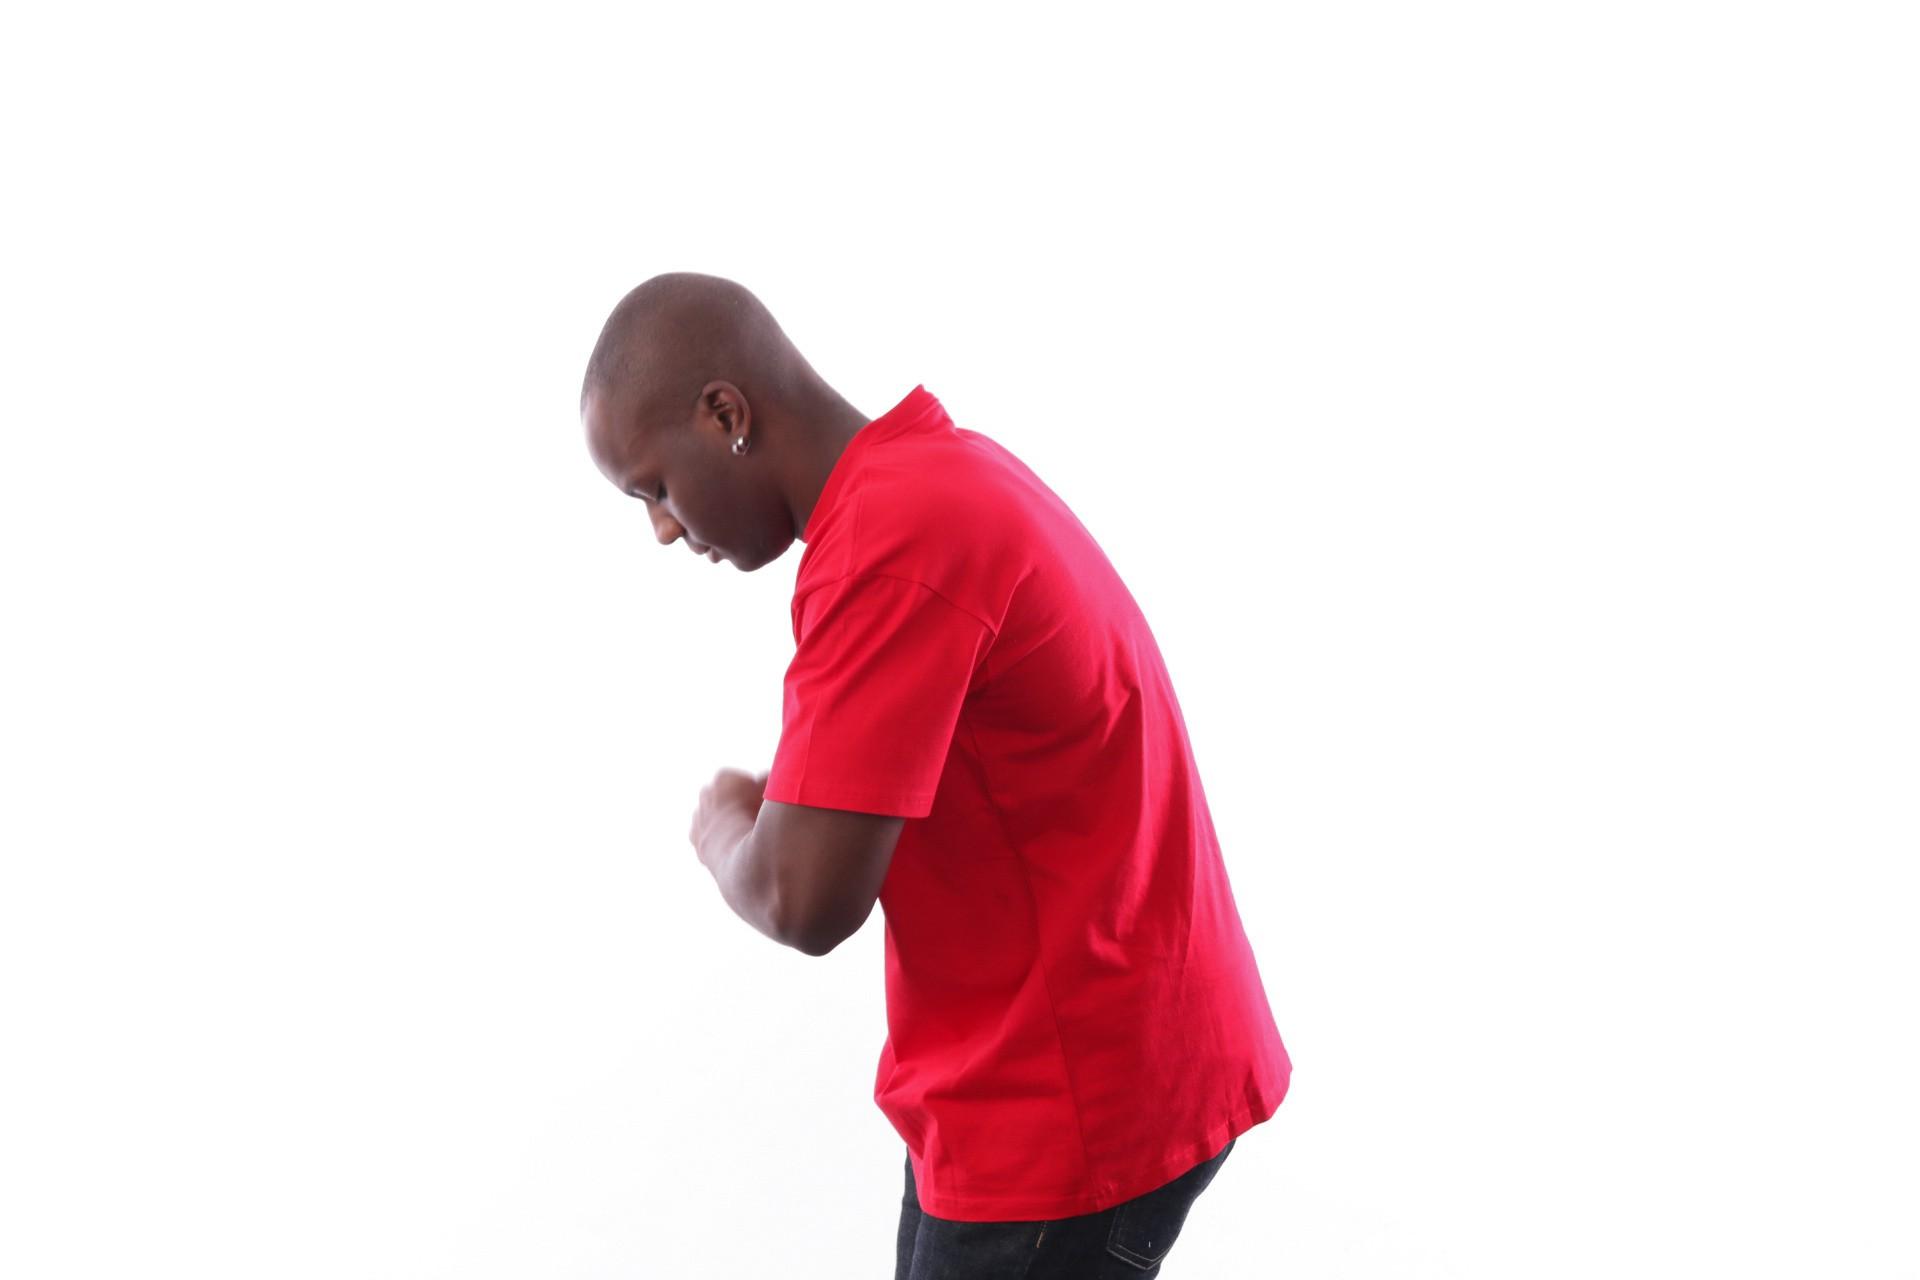 Afbeelding van Carhartt Wip S/S Chase T-Shirt I026391 T Shirt Cardinal / Gold